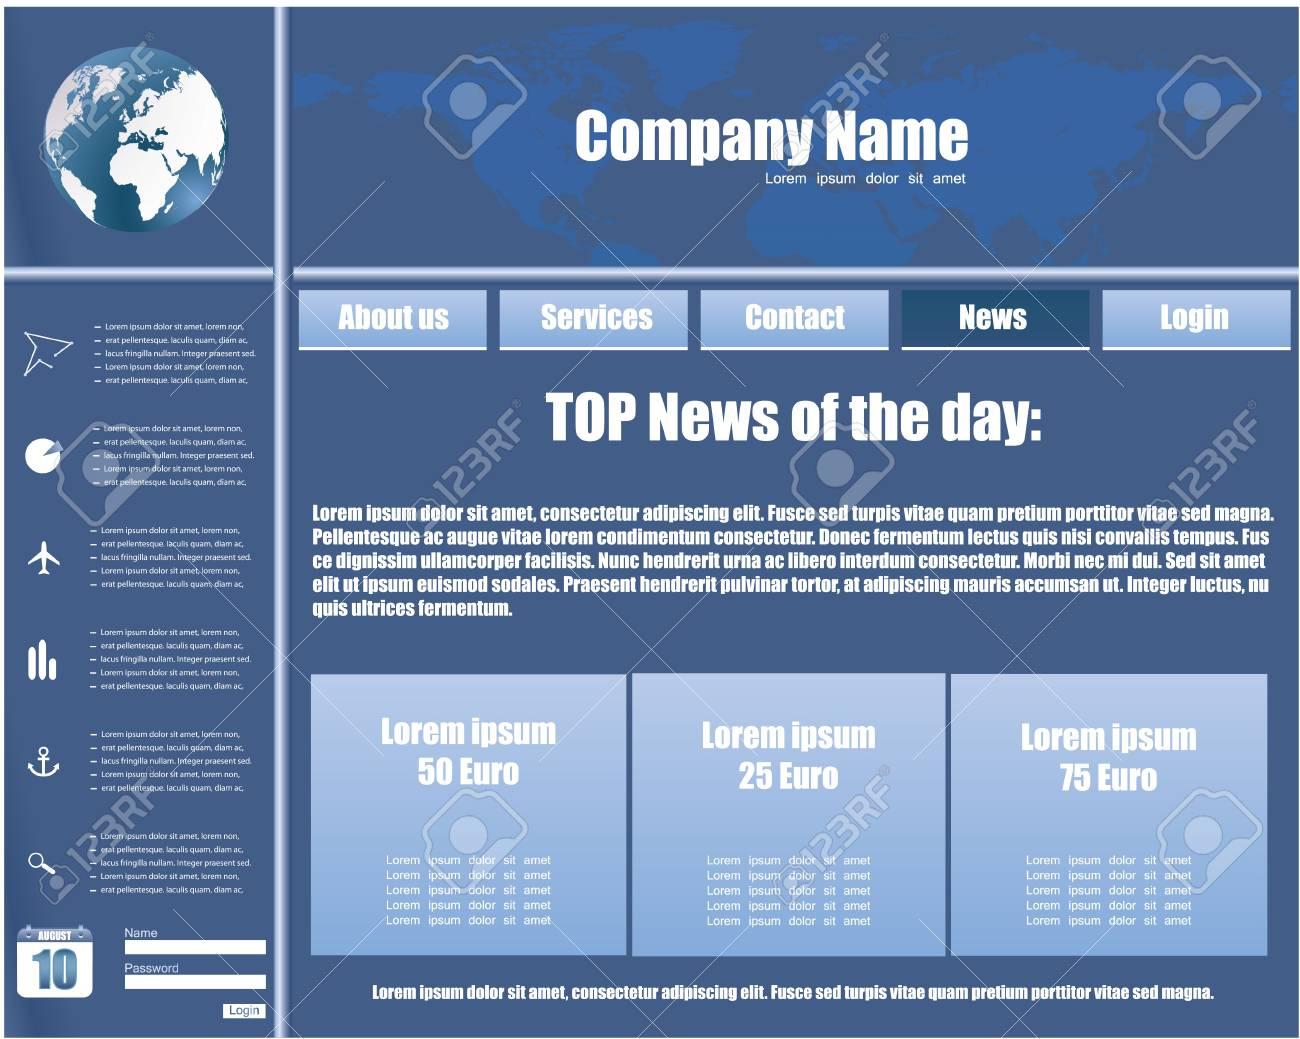 Business website template in editable format Stock Vector - 8760579